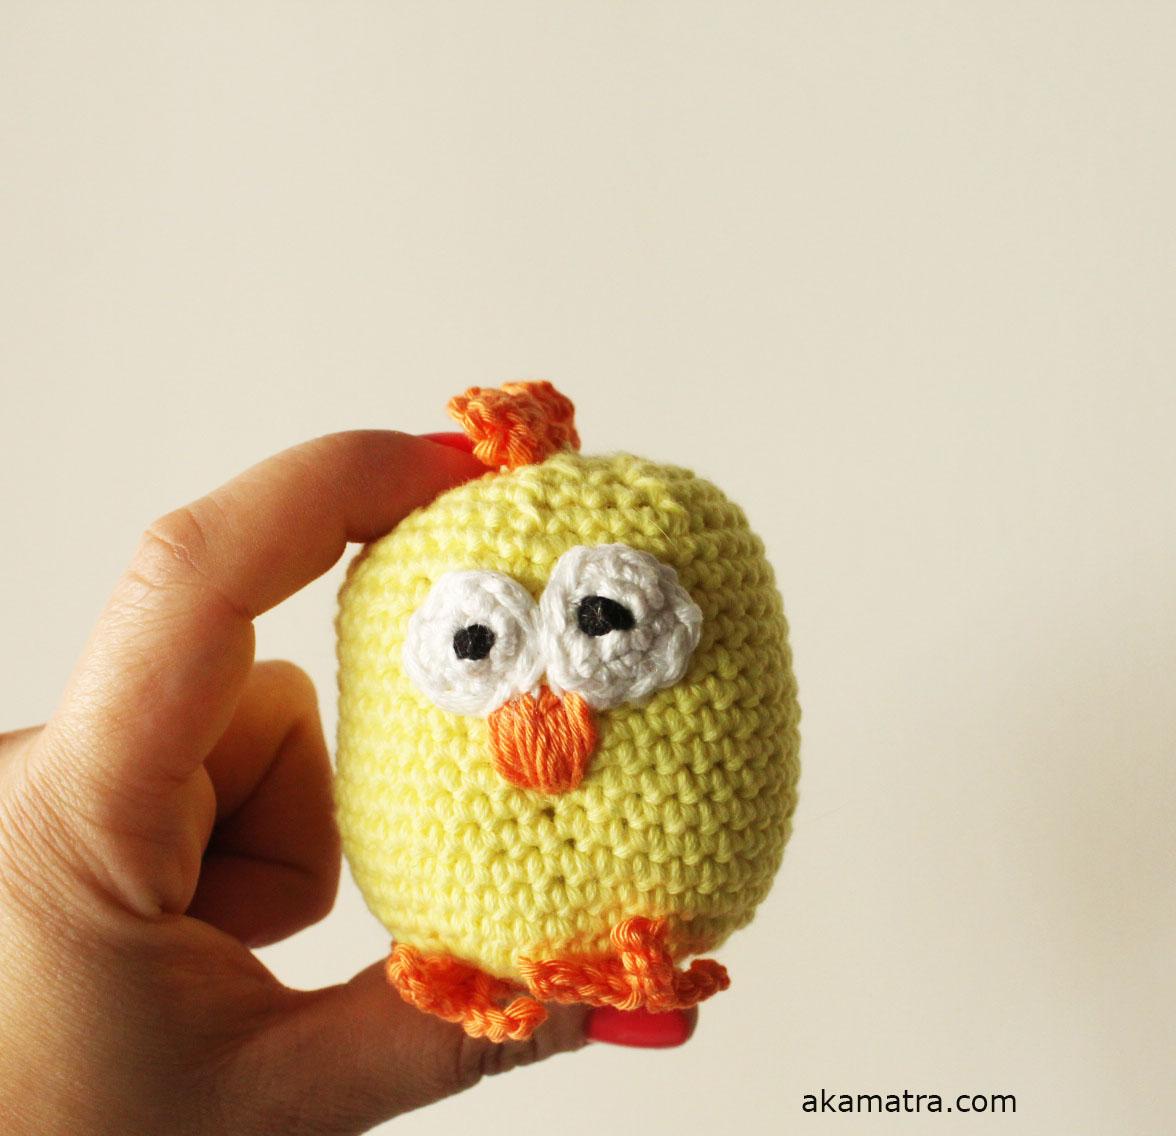 Crochet an Easter Chicken - Free pattern - Akamatra